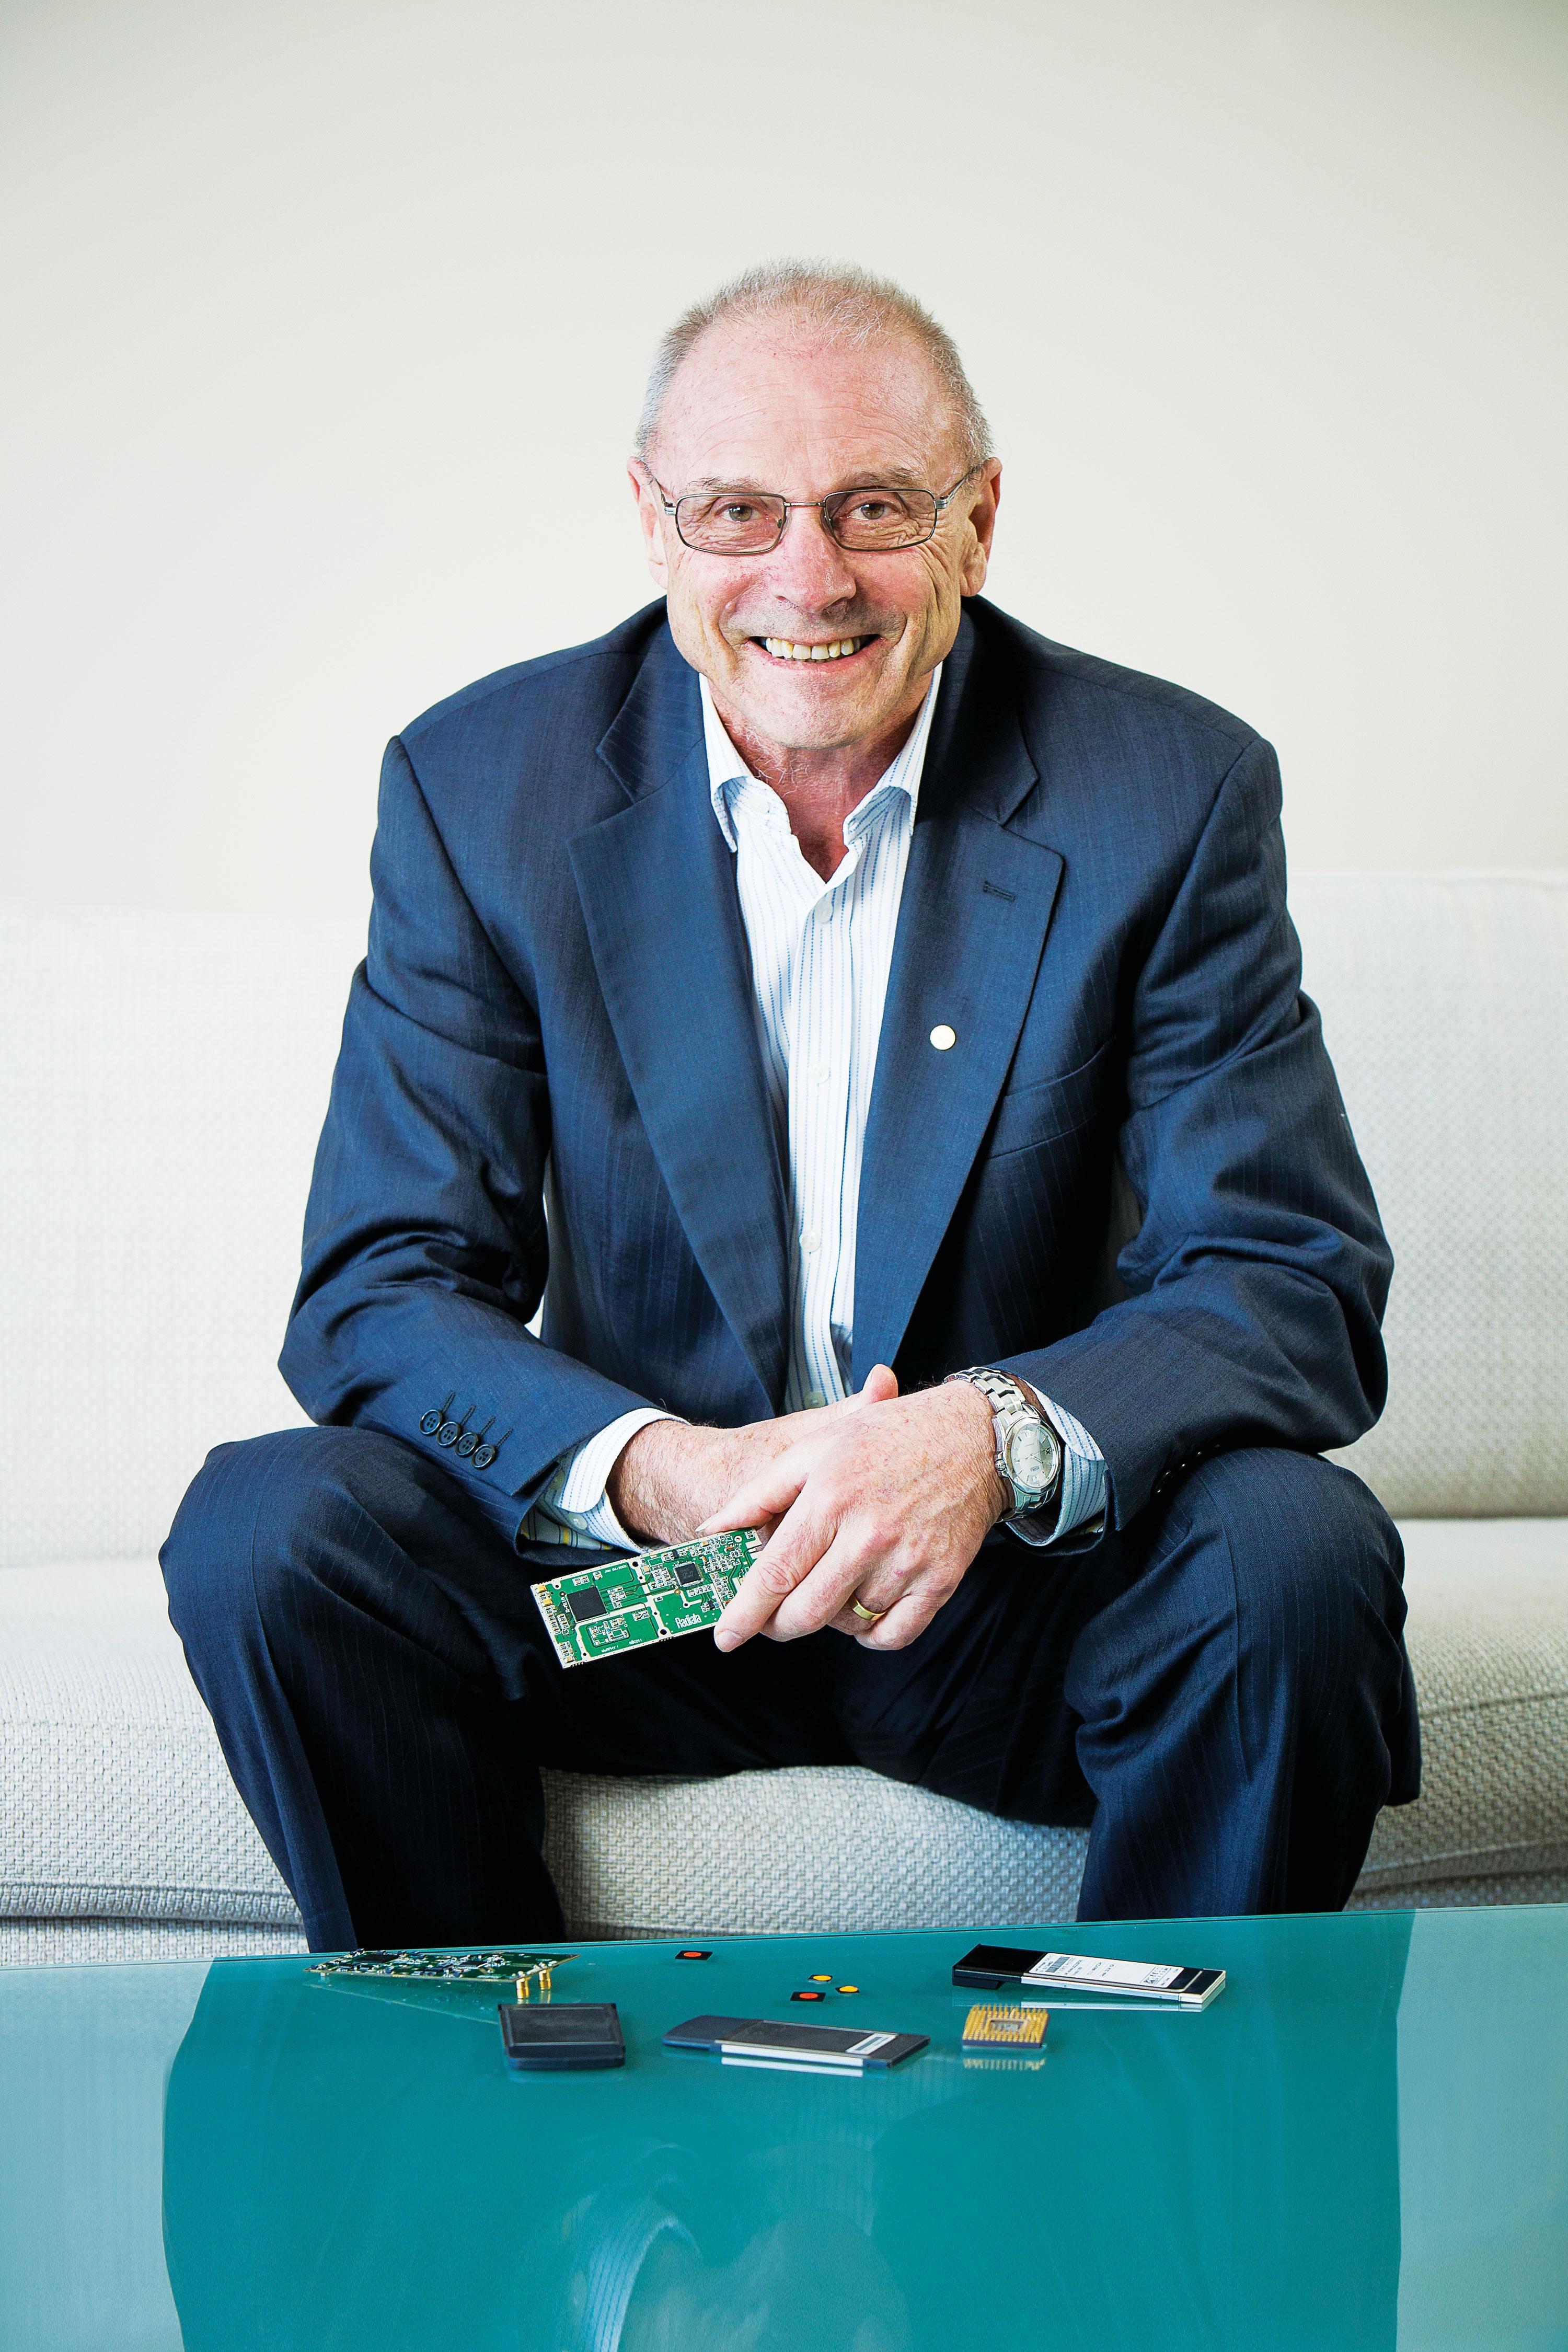 John O'Sullivan helped invent WiFi